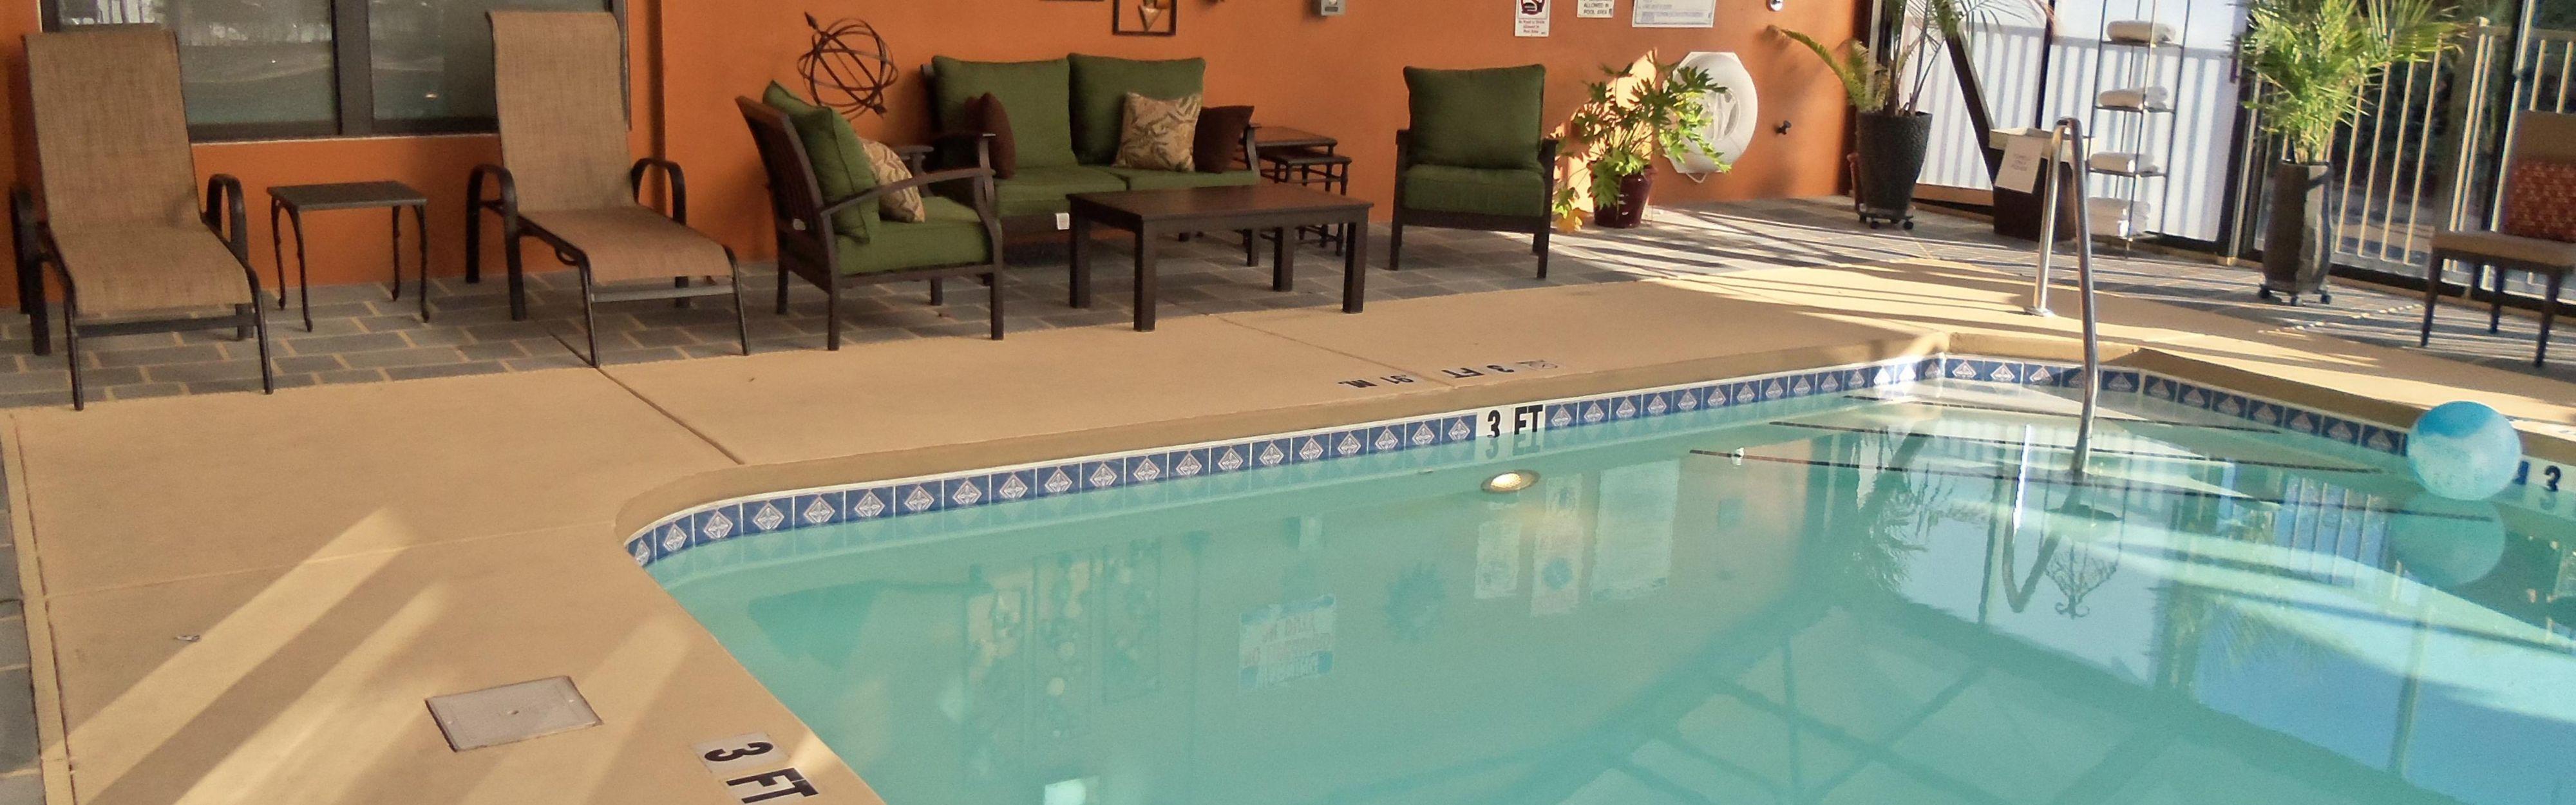 Holiday Inn Express & Suites Sanford image 2